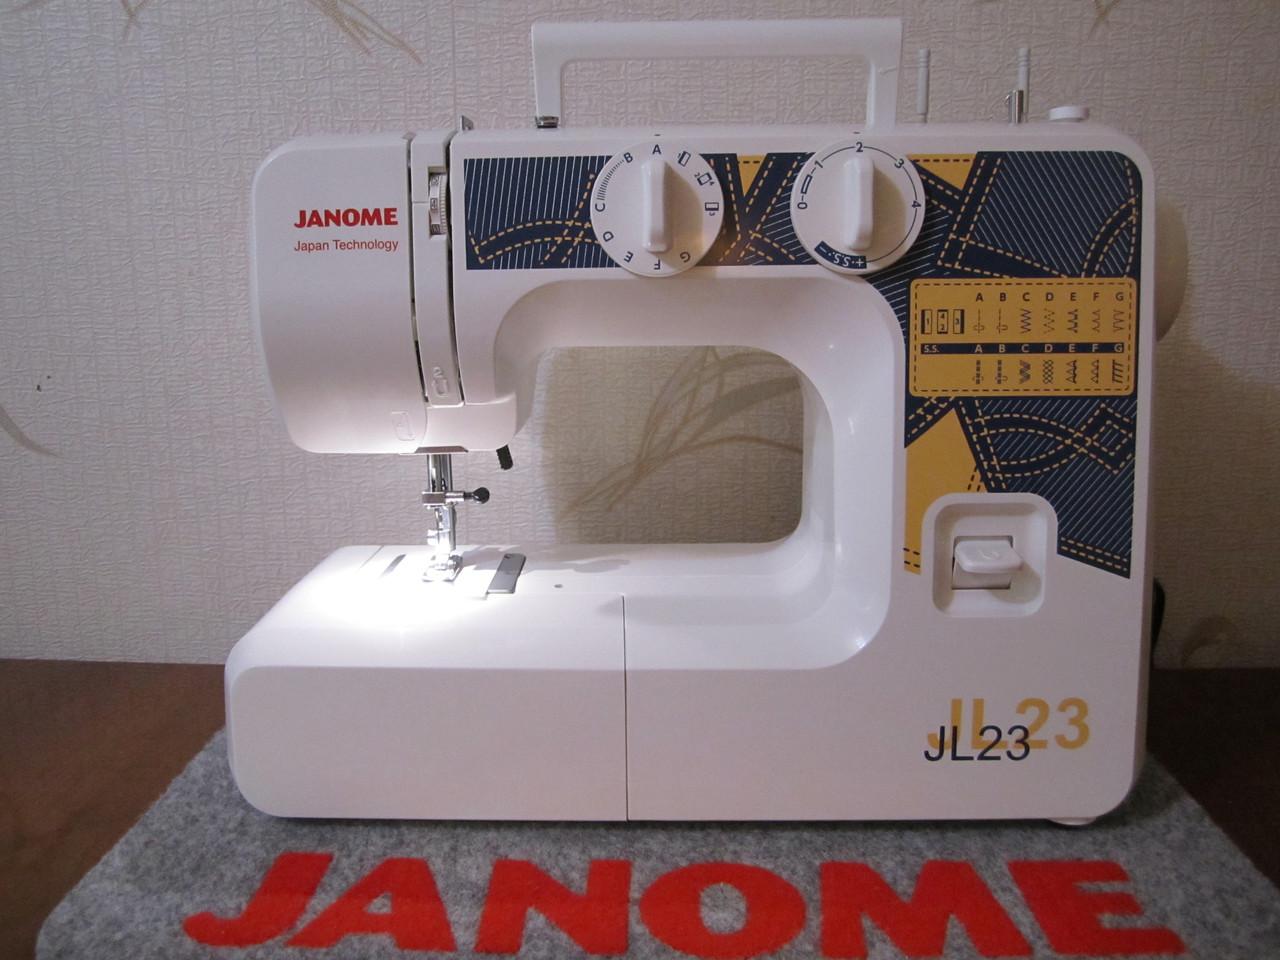 Janome JL-23 Швейная машина